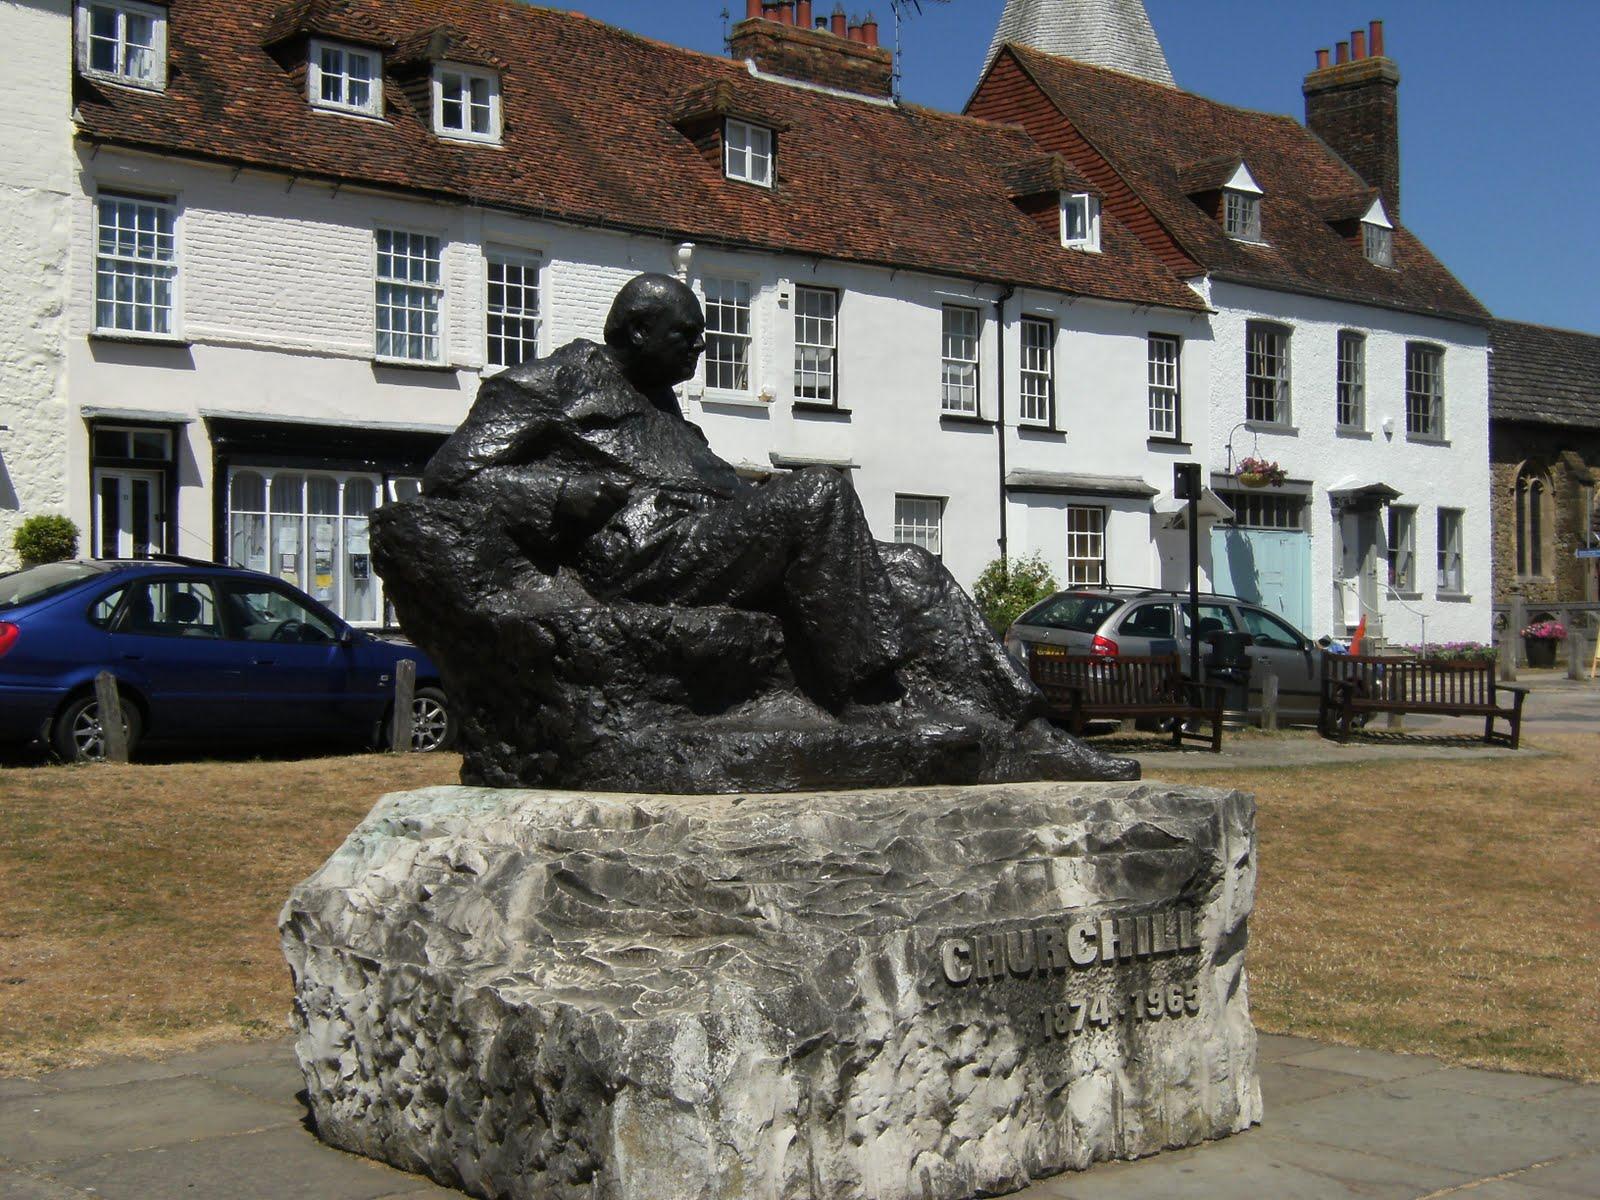 1007100005 Statue of Churchill, Westerham Green